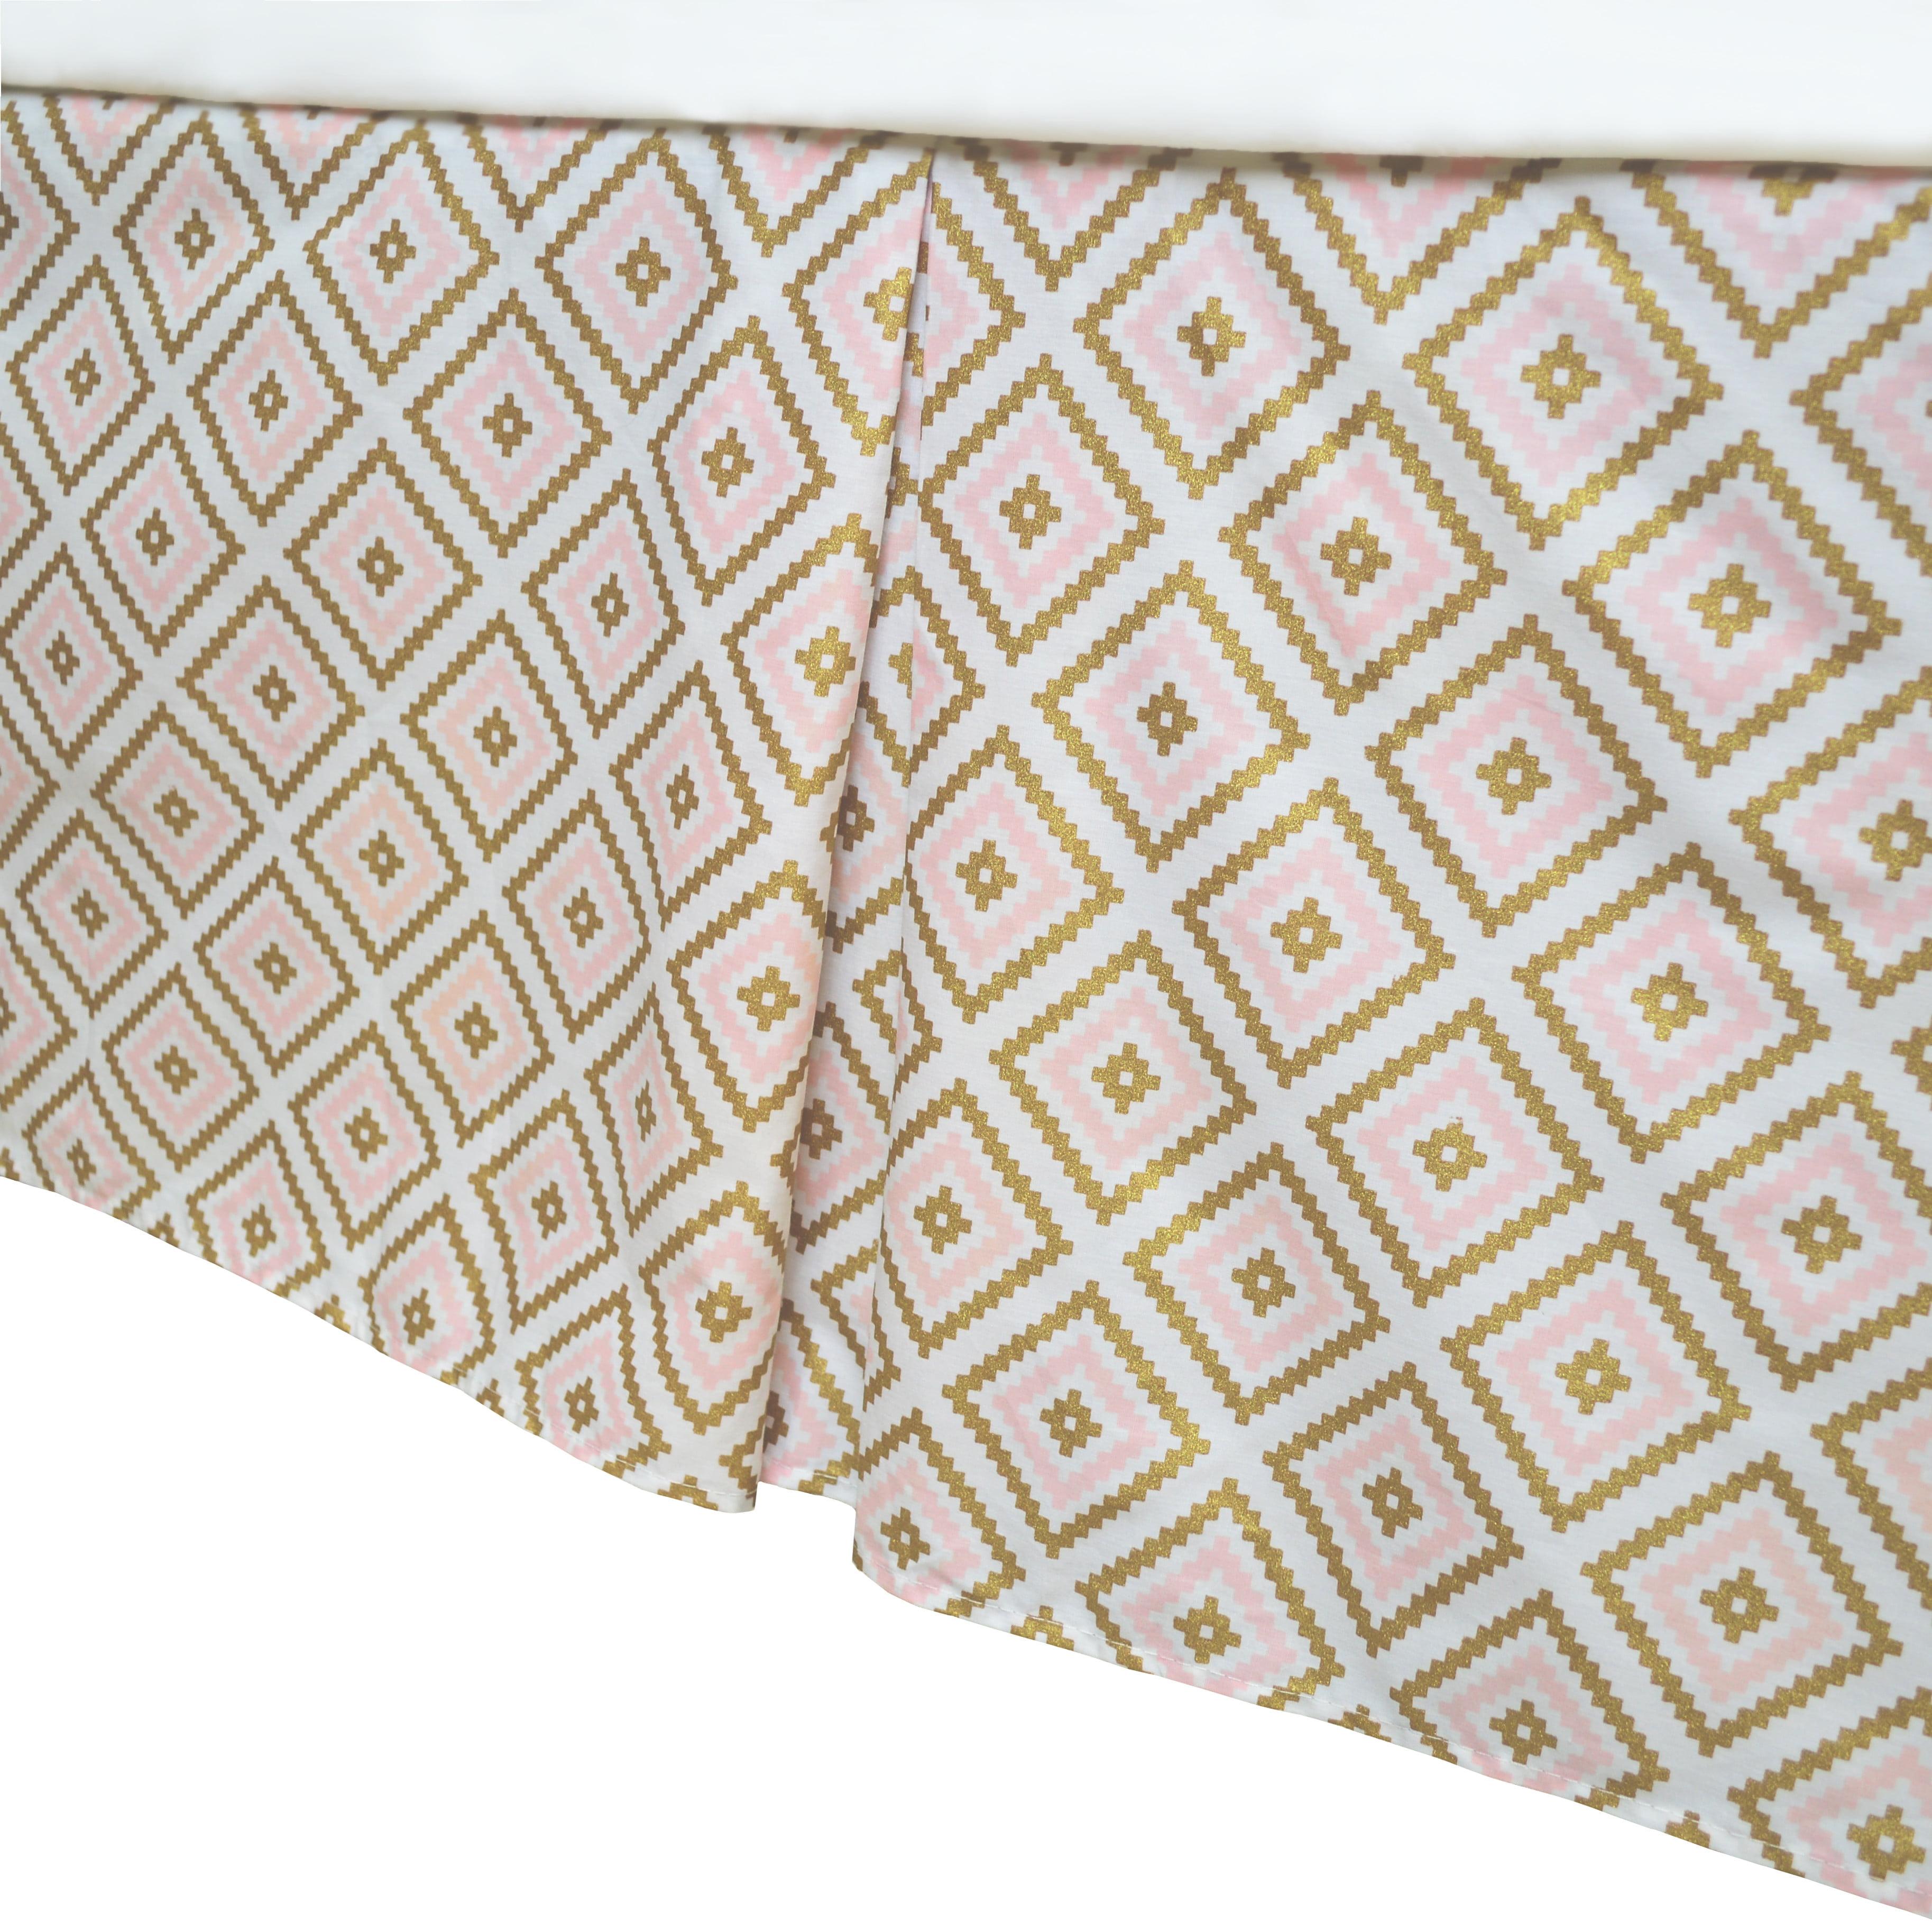 American Baby Company Crib Skirt,Sparkle Gold/PinkKilim